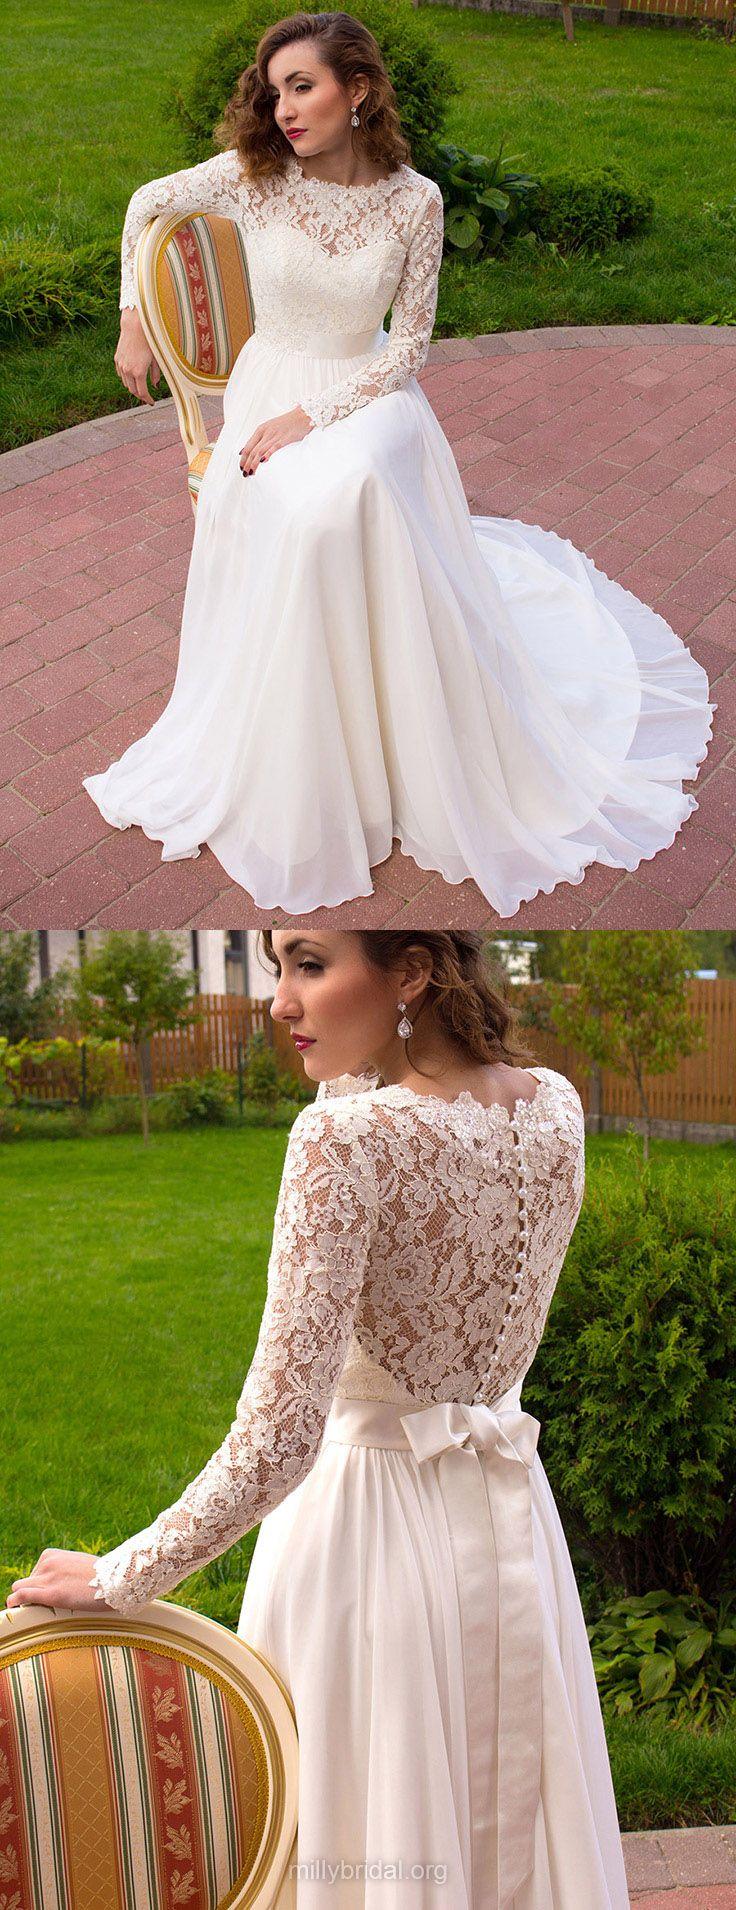 Lace Wedding Dresses A-line, 2018 Bridal Gowns Long Sleeve, Modest Wedding Dress Scoop Neck Chiffon, Elegant Wedding Dresses Cheap